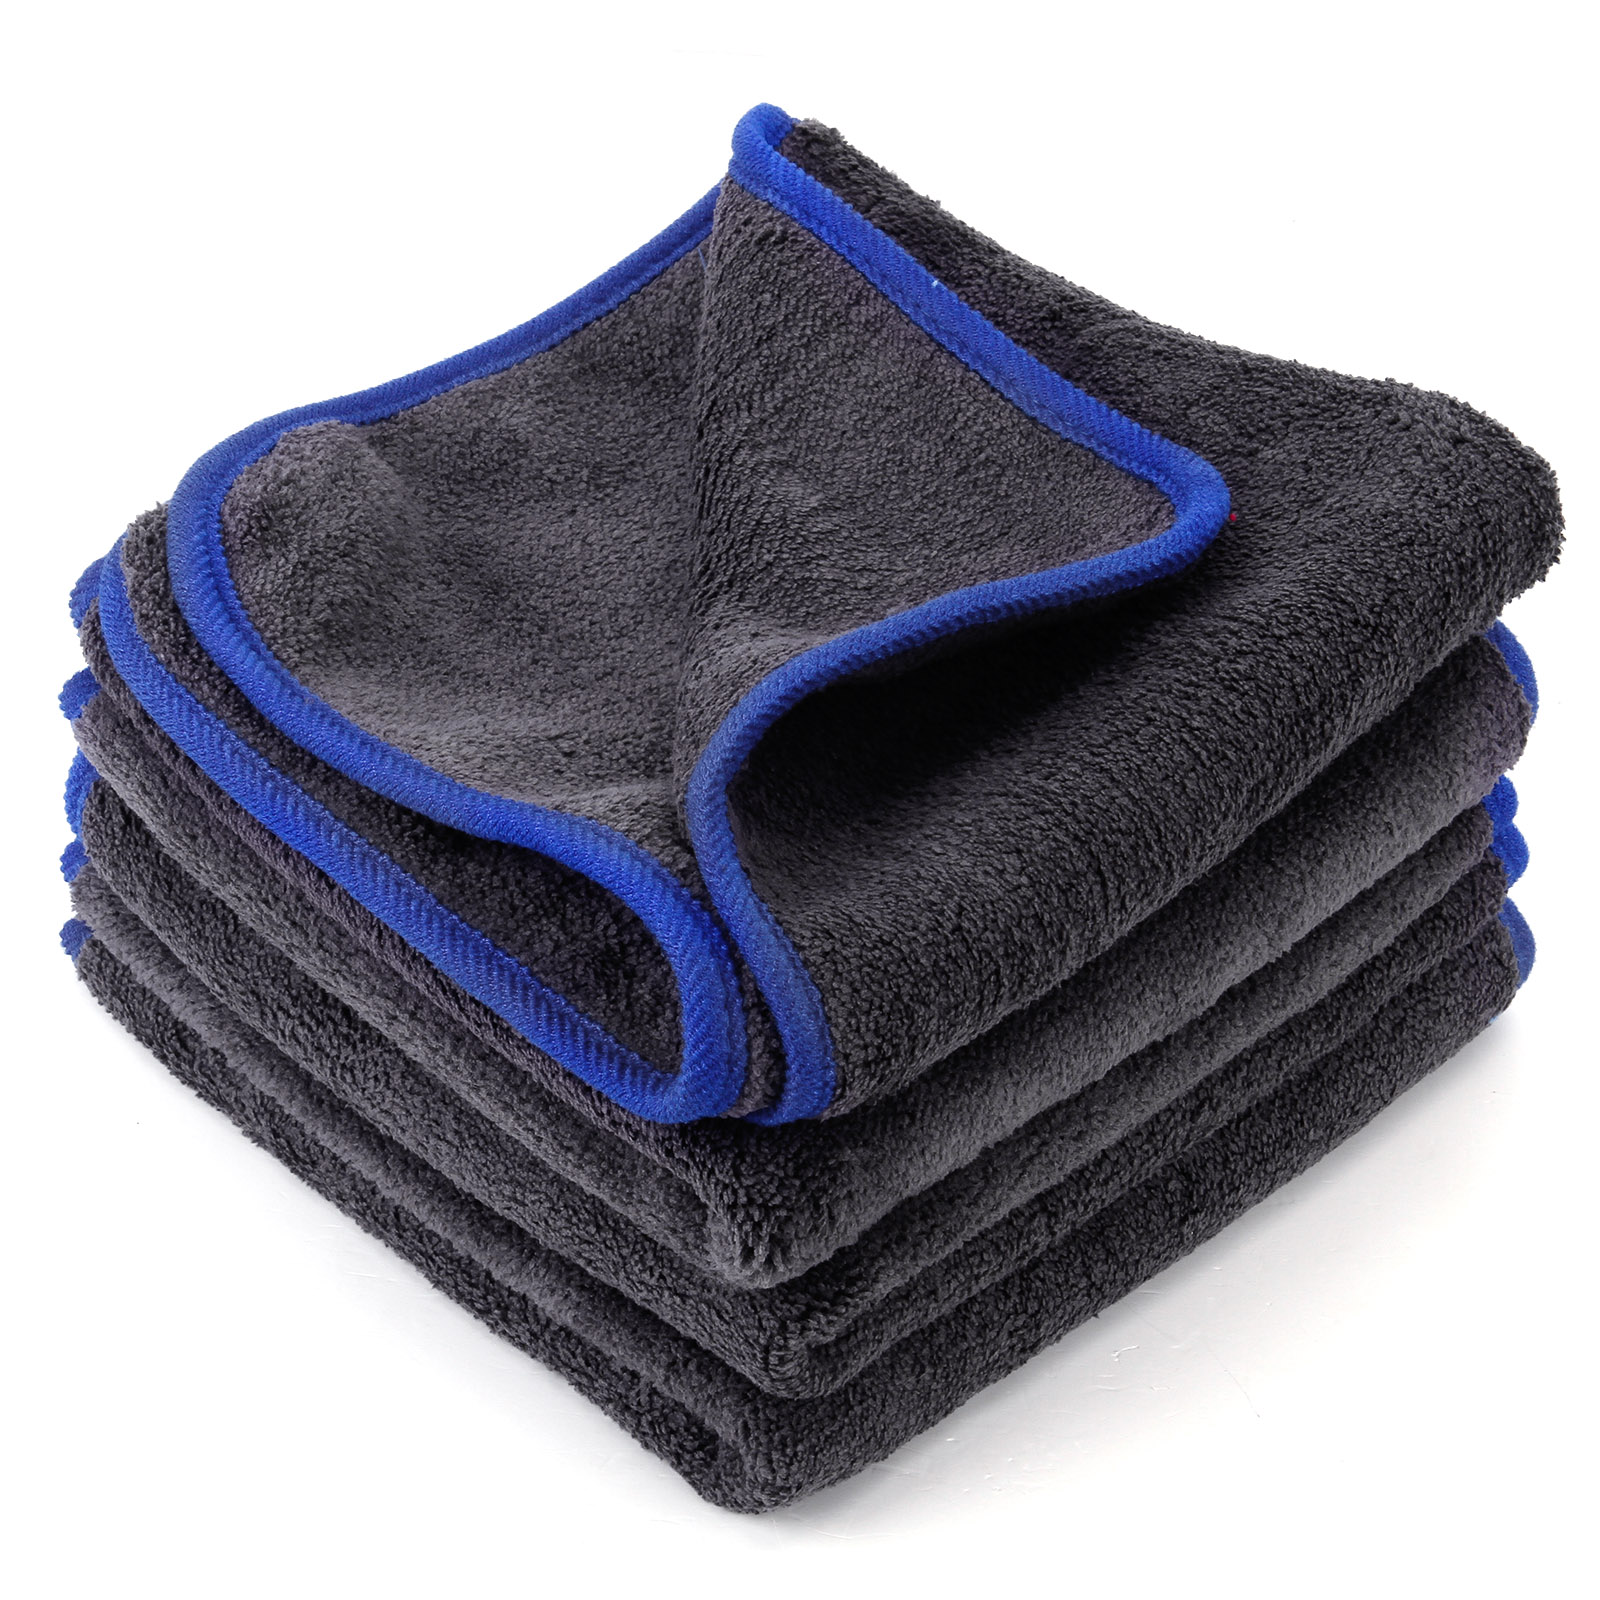 4x car cleaning detailing microfibre soft polish cloths